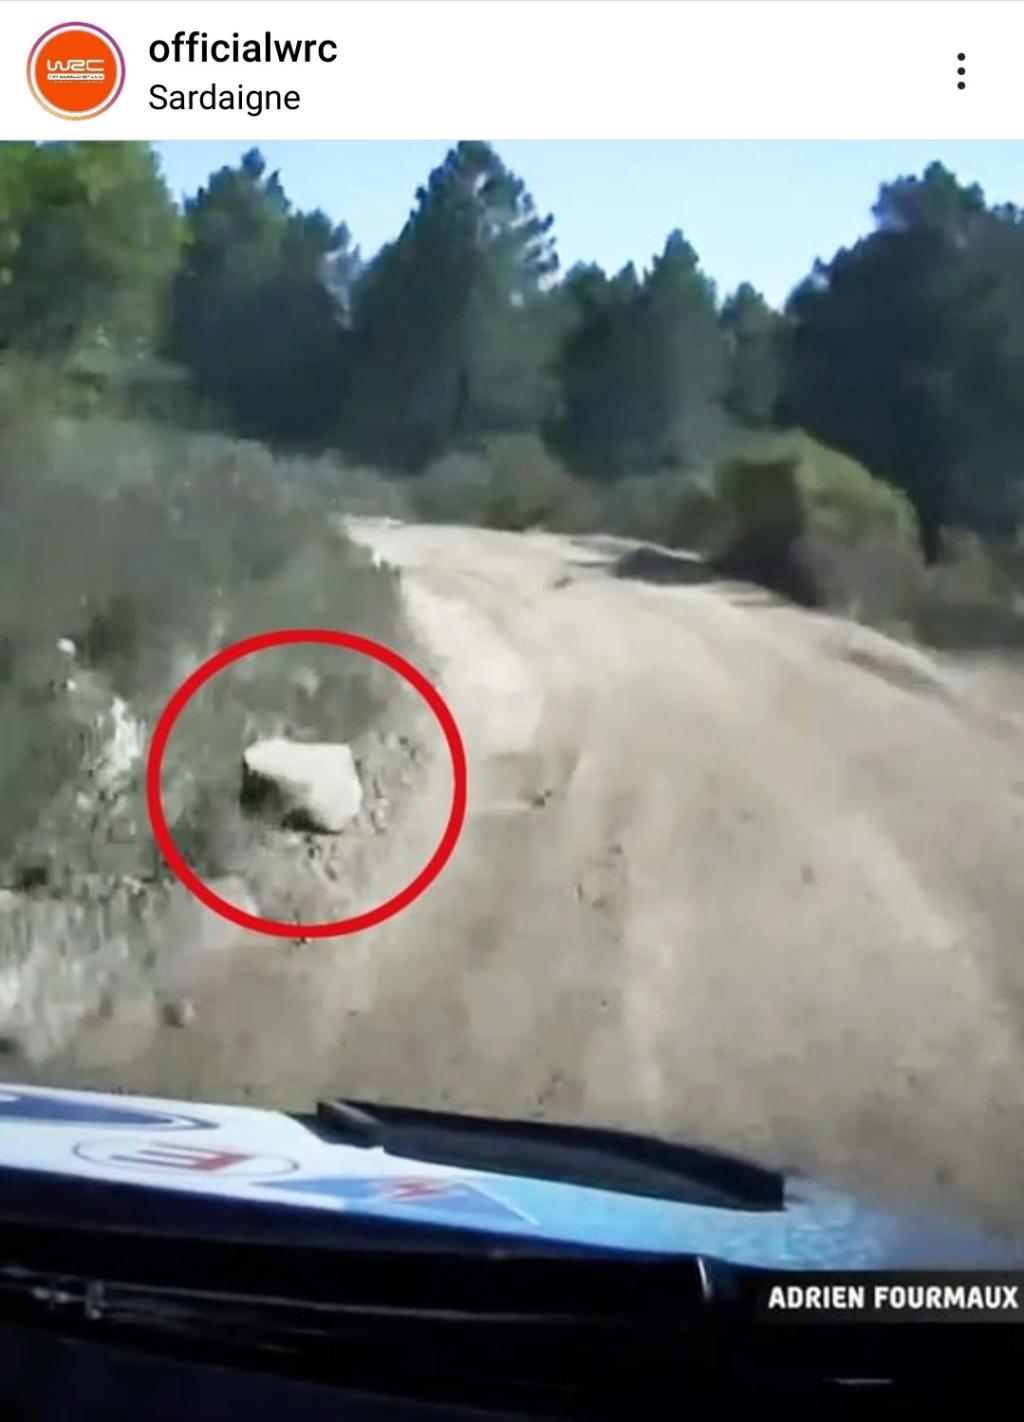 WRC: Rally d'Italia - Sardegna [3-6 Junio] - Página 3 Cerdez11